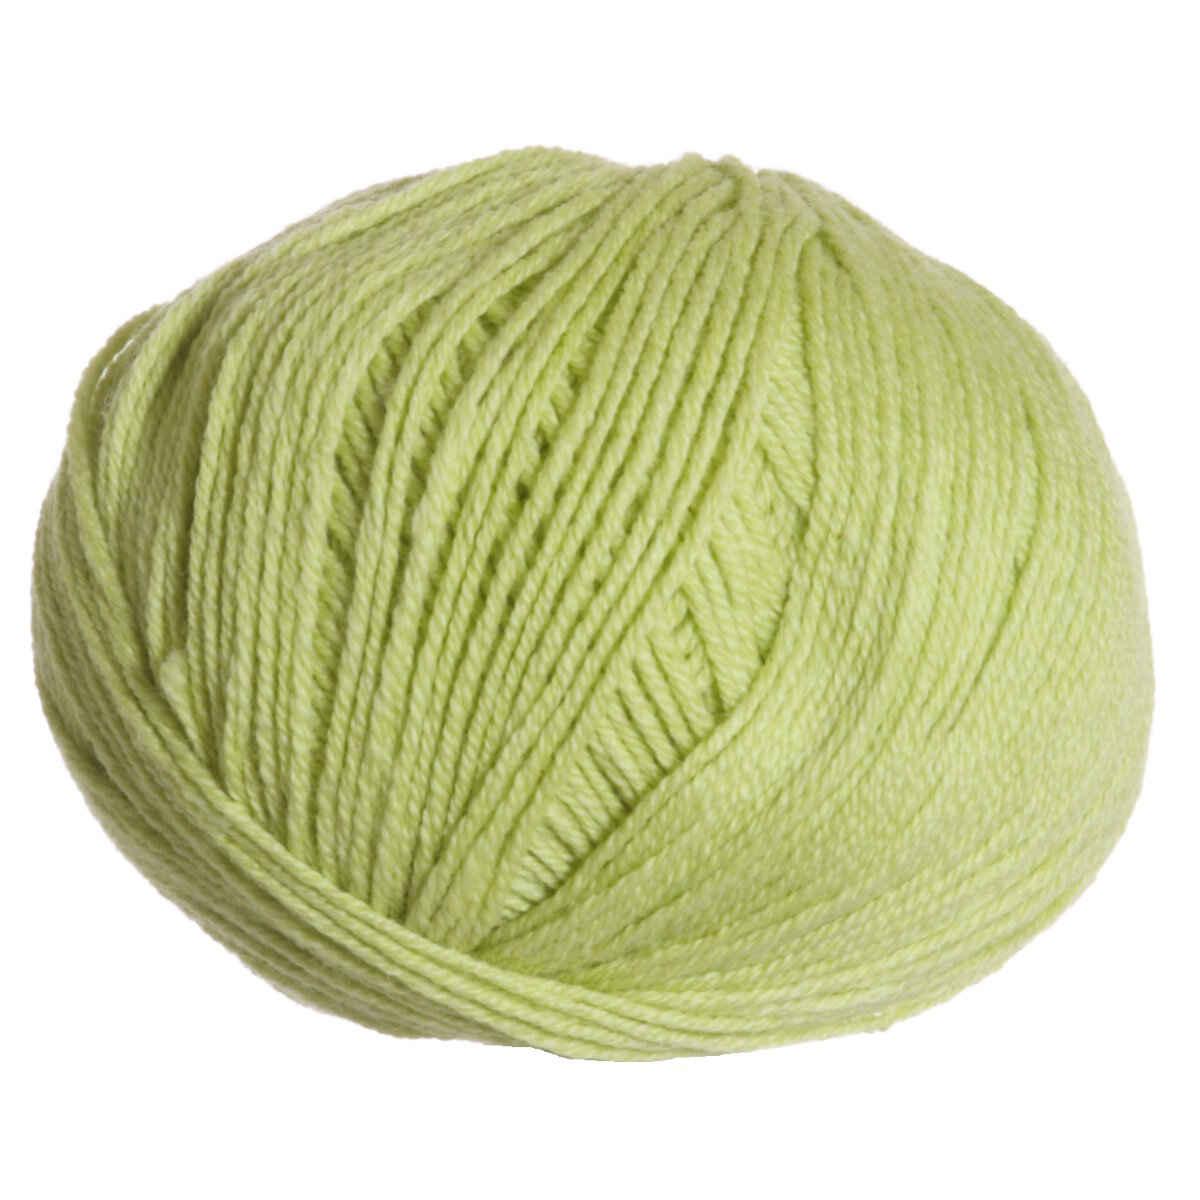 Rowan Yarn : Rowan Wool Cotton 4ply Yarn Reviews at Jimmy Beans Wool